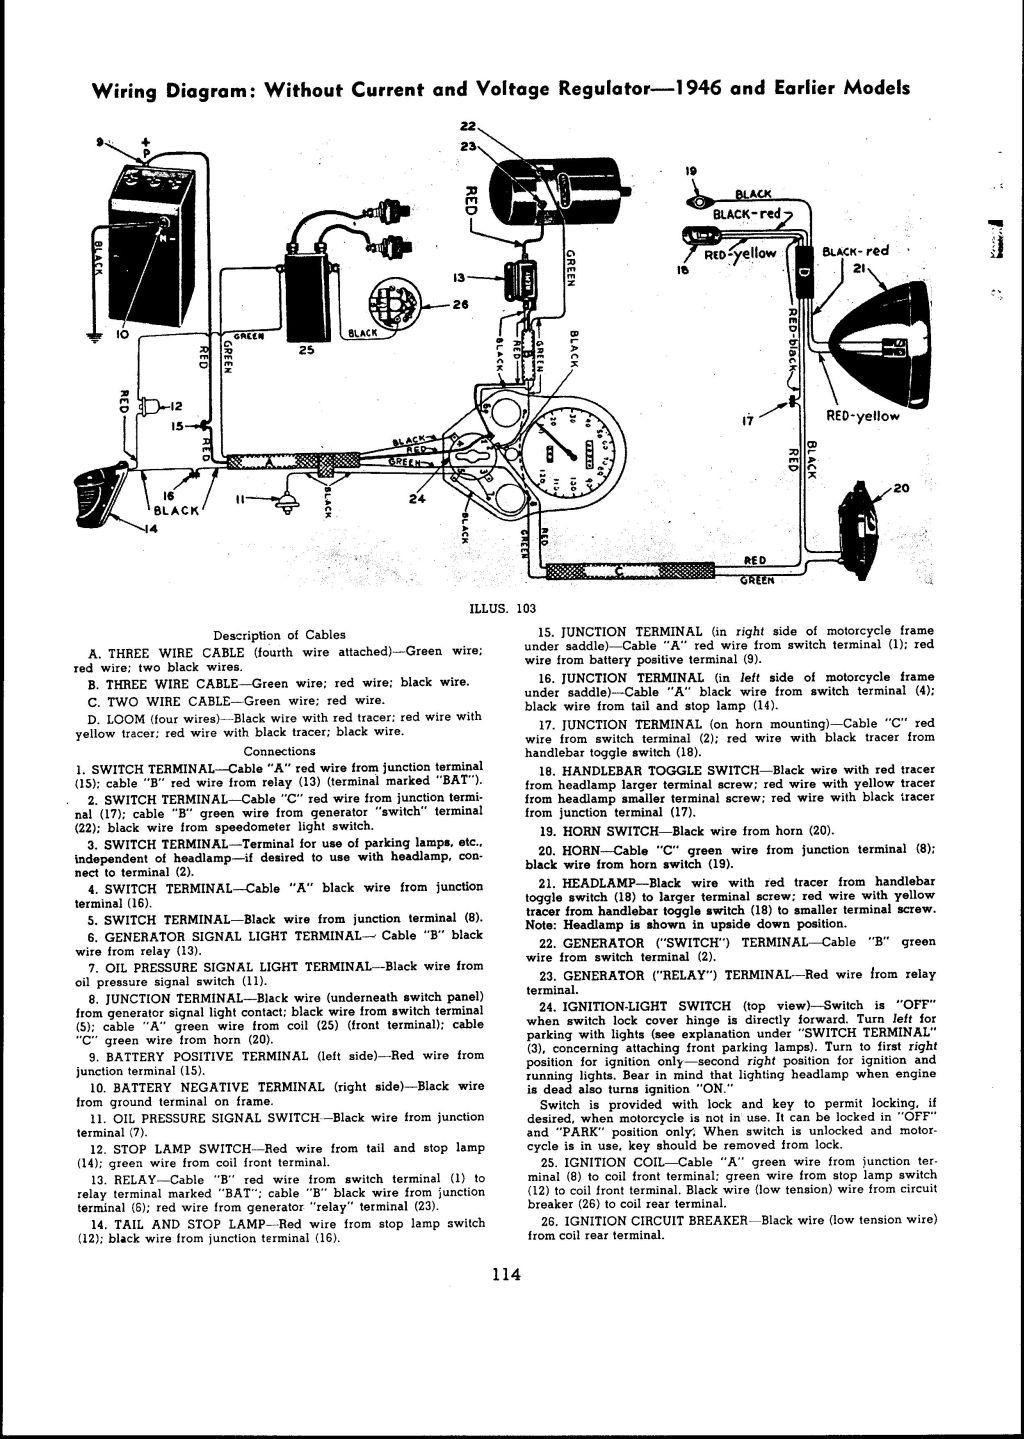 1941 harley davidson wl restoration re wiring the harley basic harley wiring diagram basic harley wiring diagram [ 1024 x 1439 Pixel ]